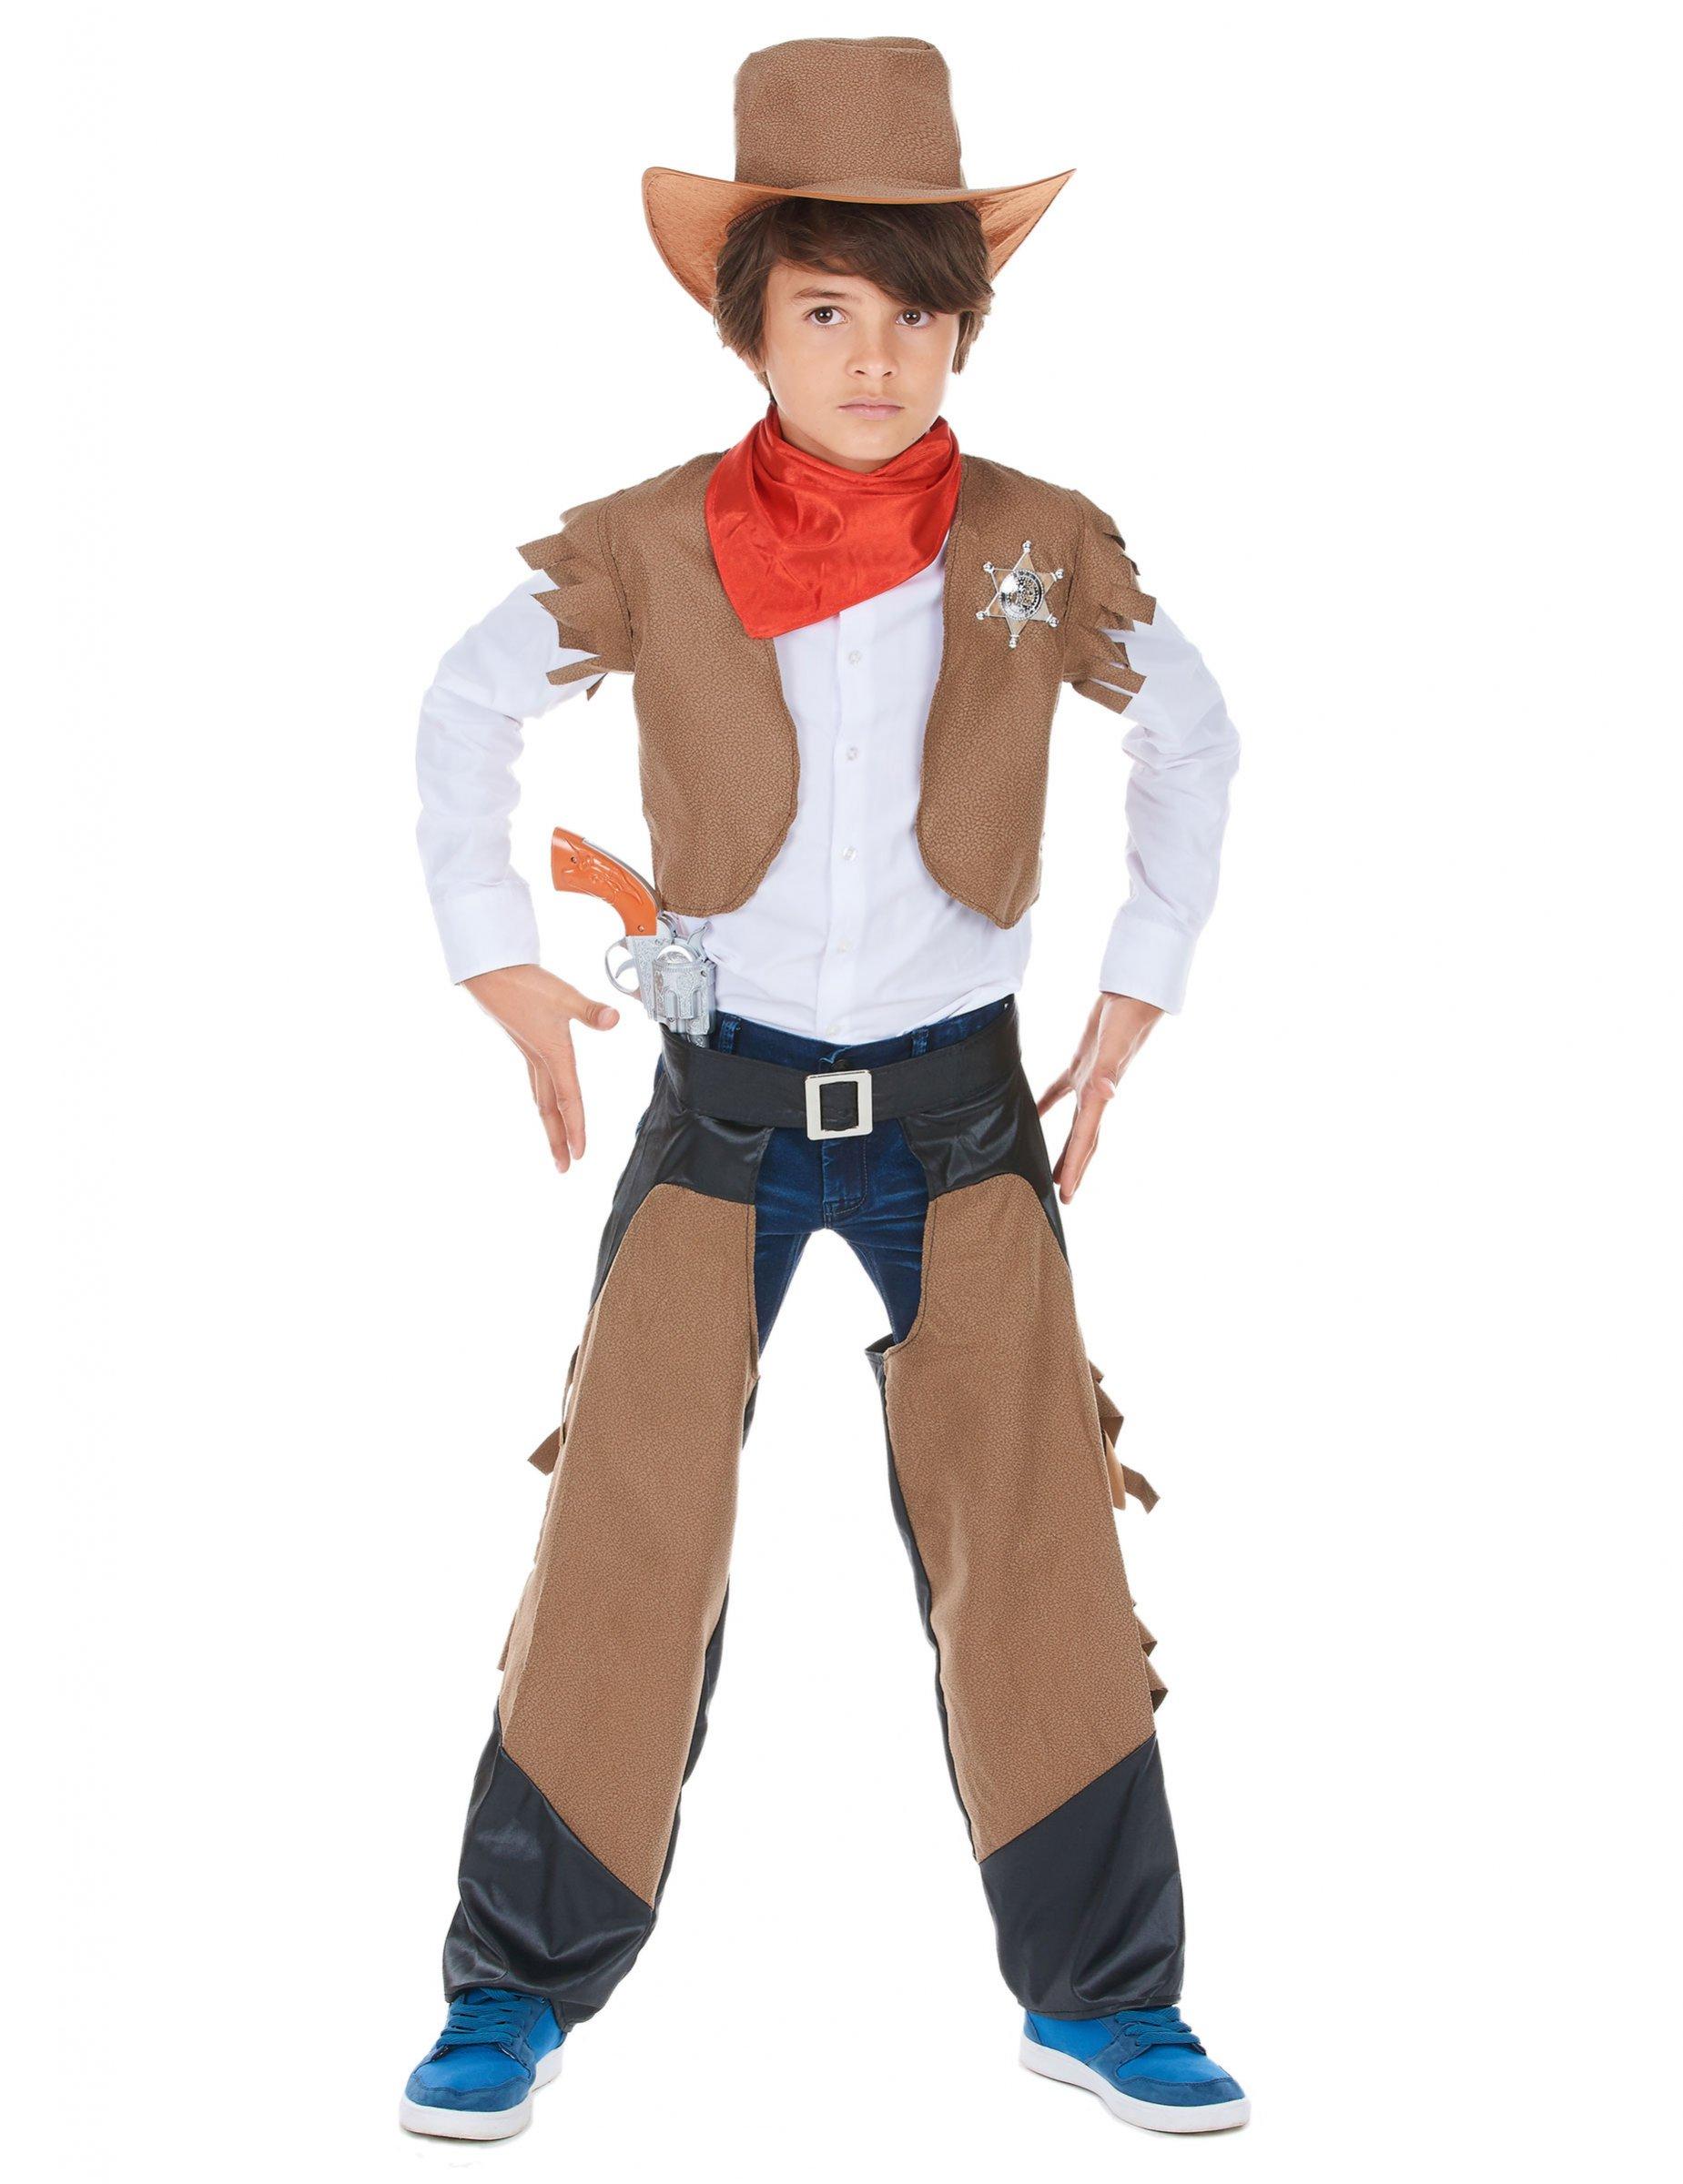 Deguisement cowboy enfant - Deguisetoi